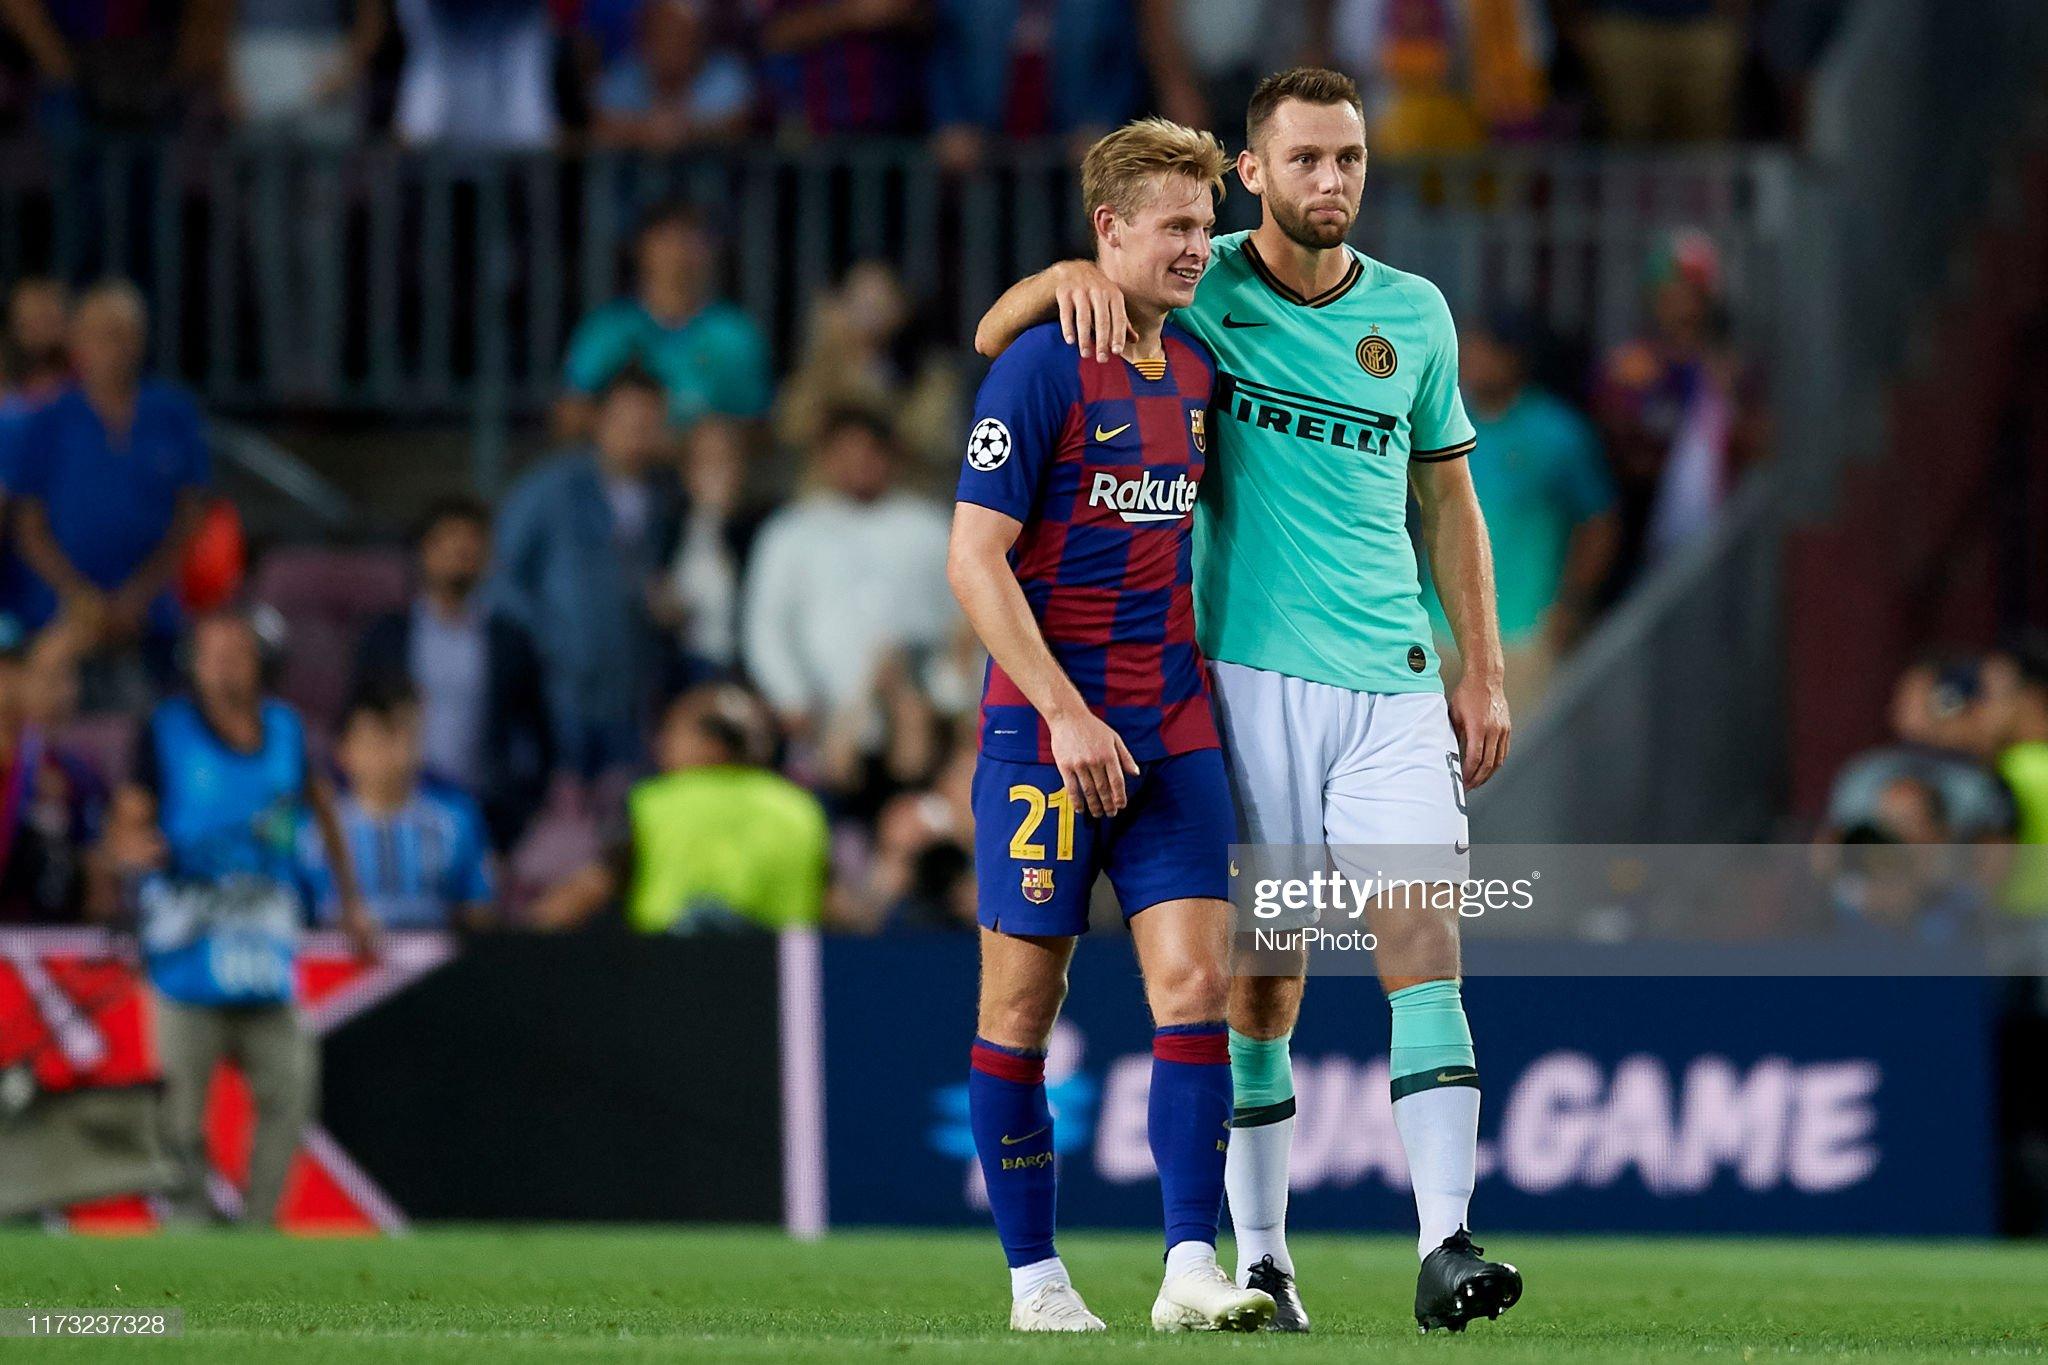 صور مباراة : برشلونة - إنتر 2-1 ( 02-10-2019 )  Frenkie-de-jong-of-barcelona-and-stefan-de-vrij-of-inter-of-milan-picture-id1173237328?s=2048x2048